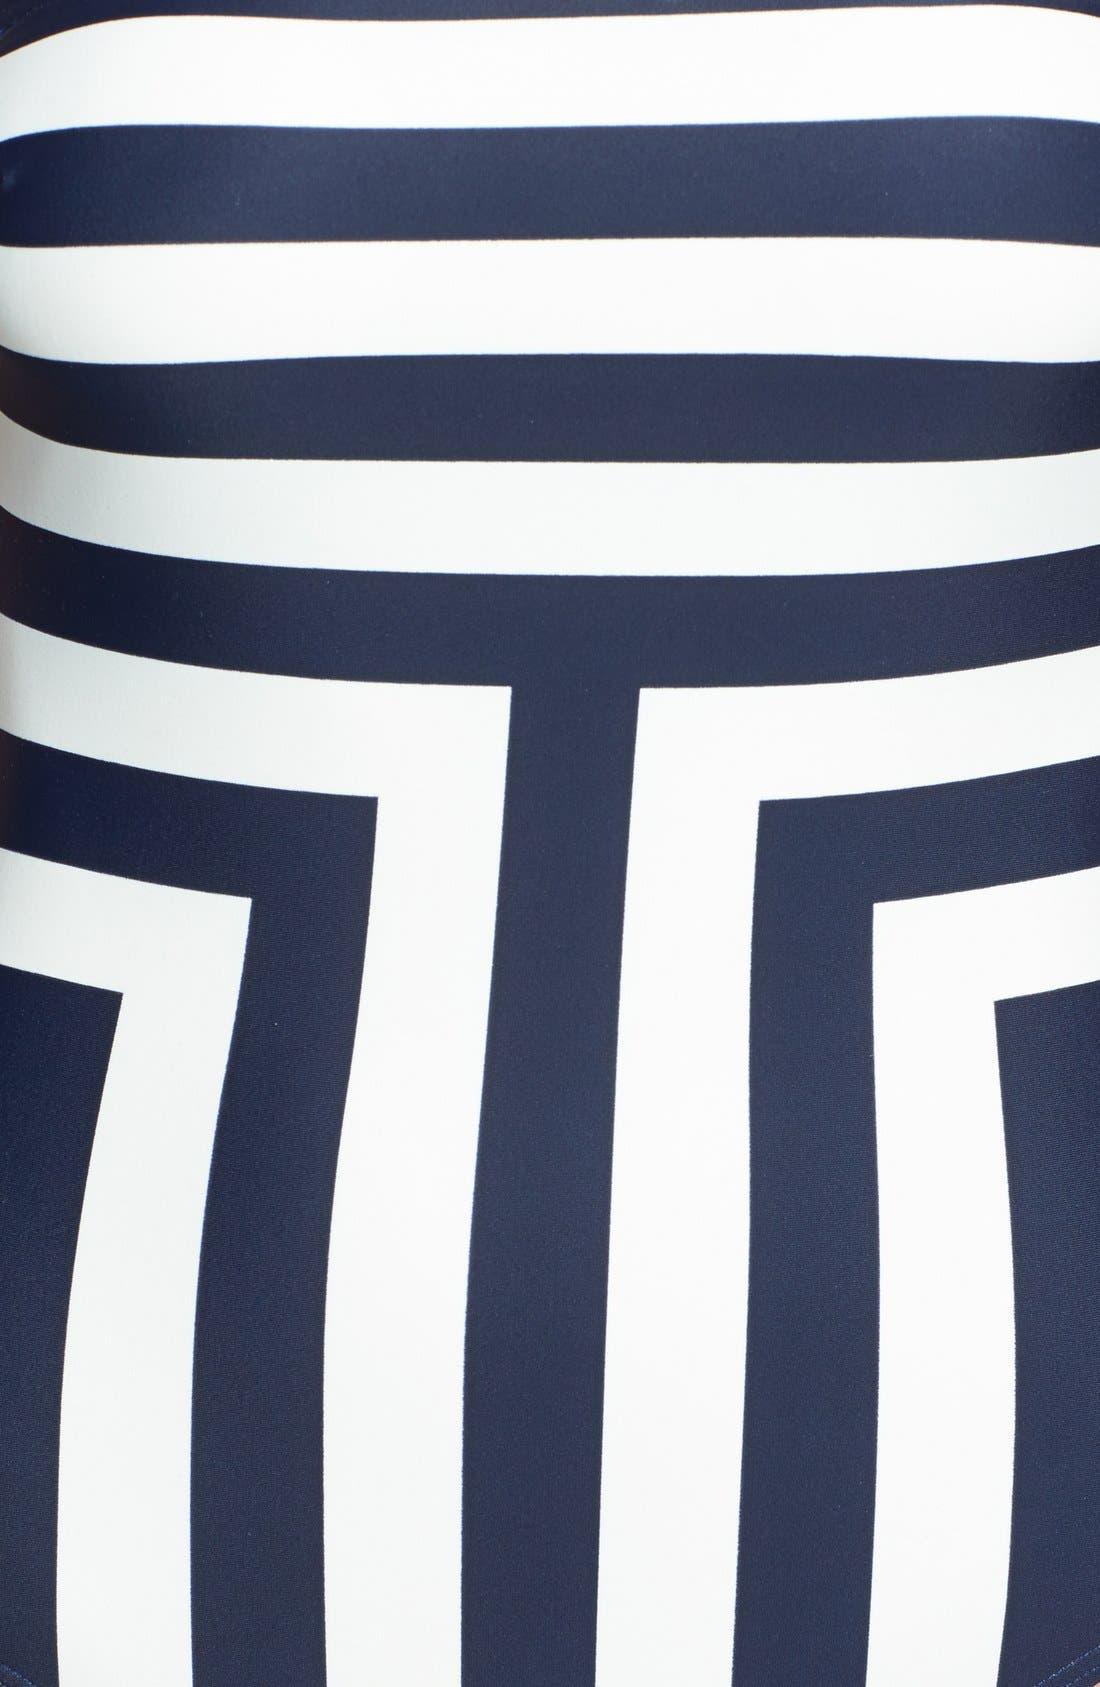 Alternate Image 3  - Ted Baker London 'Neevee New Stripe' Bandeau One-Piece Swimsuit